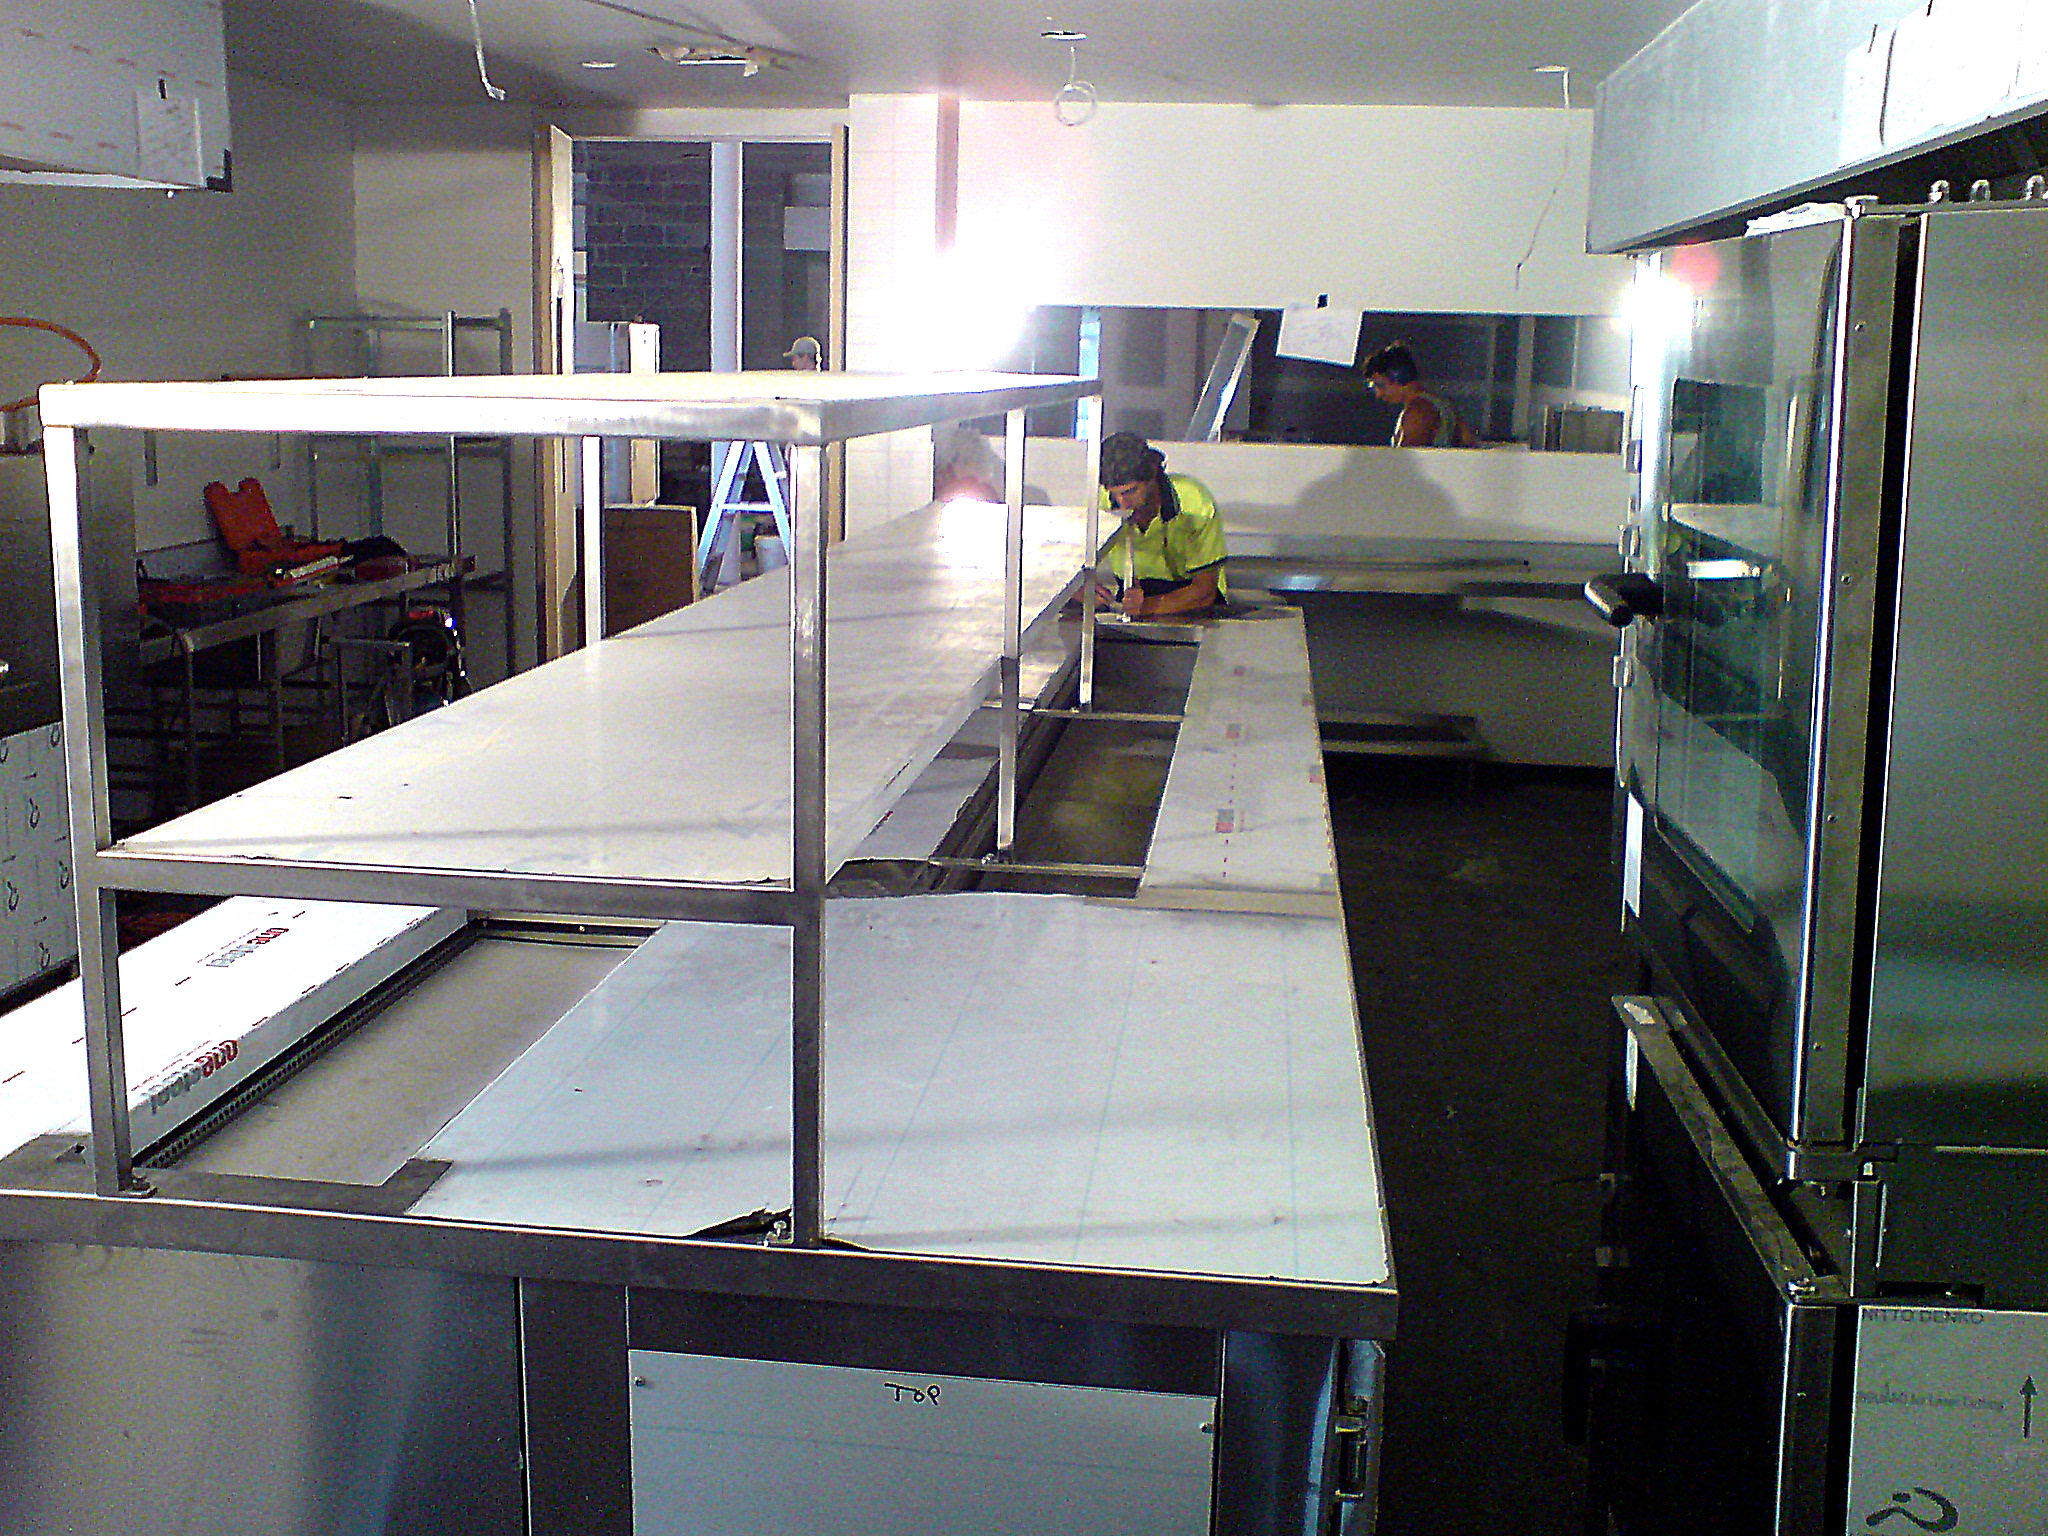 Hospitality Design Melbourne Commercial Kitchen Design Catering Equipment The Precinct Hotel31